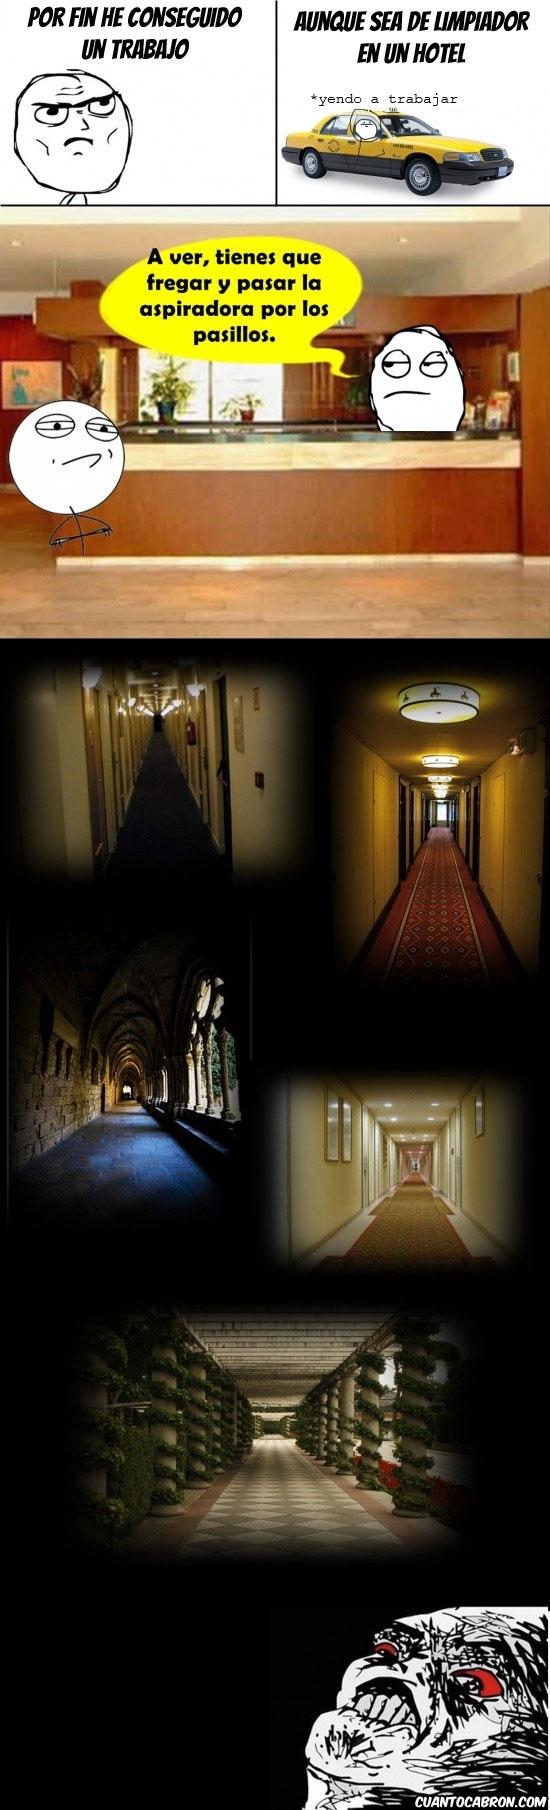 hotel,largo,miedo,pasillo,raisins,trabajo